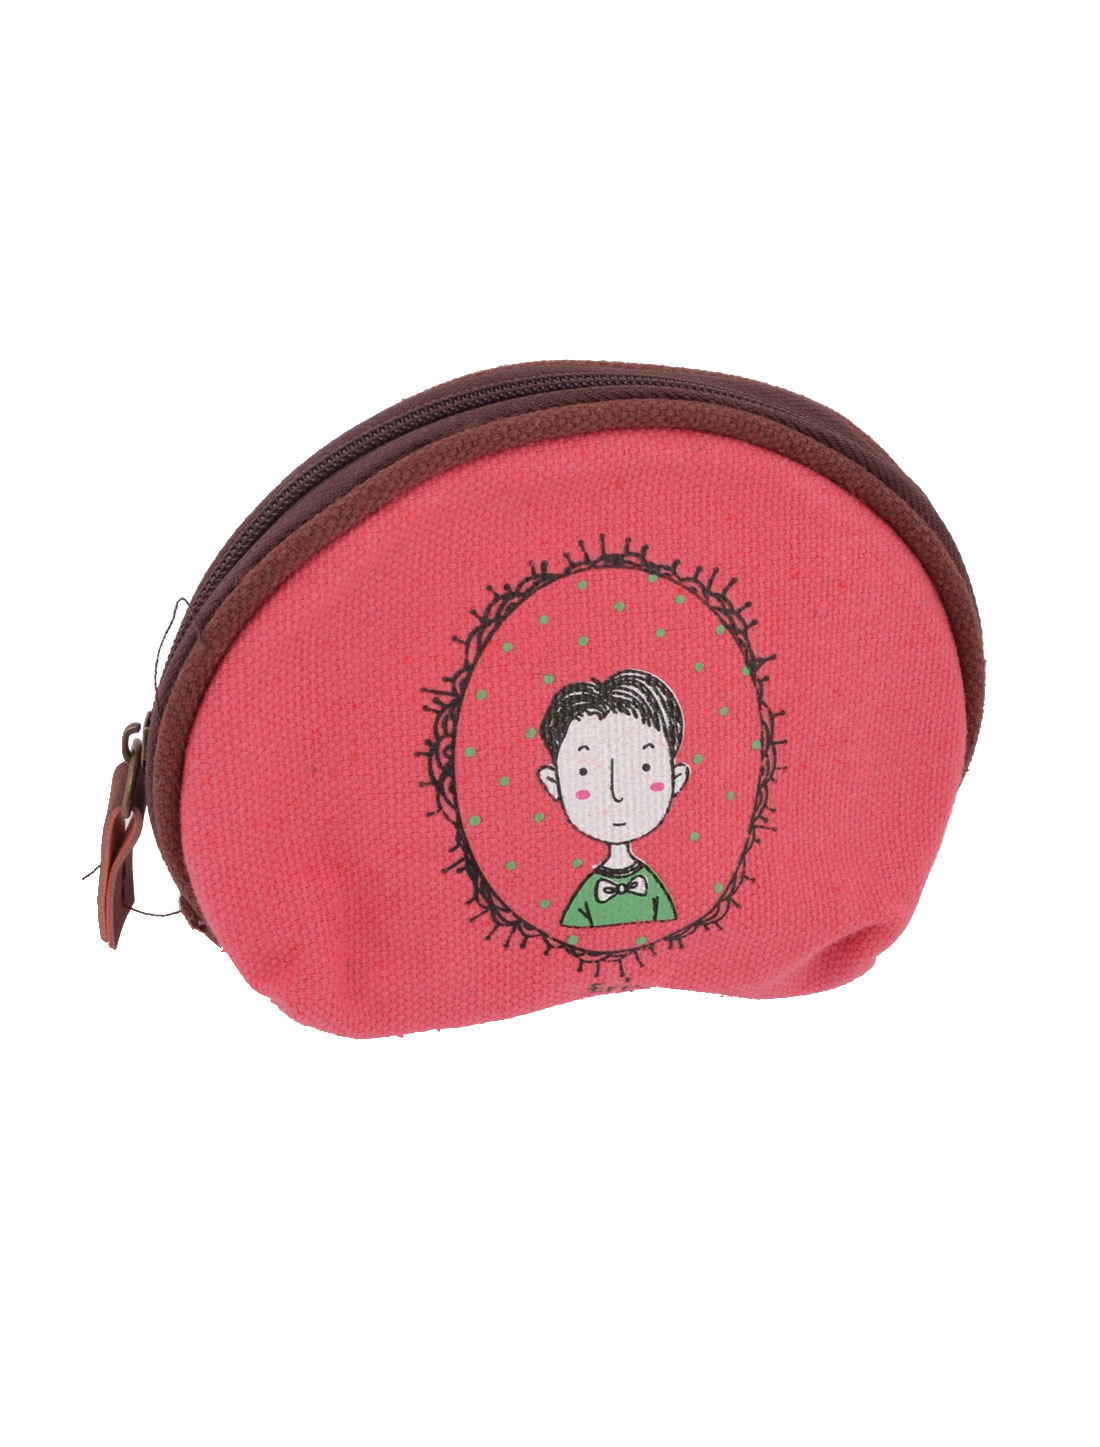 Ladies Cartoon Boy Pattern Zipper Canvas Coin Purses Wallet Bag Watermelon Red